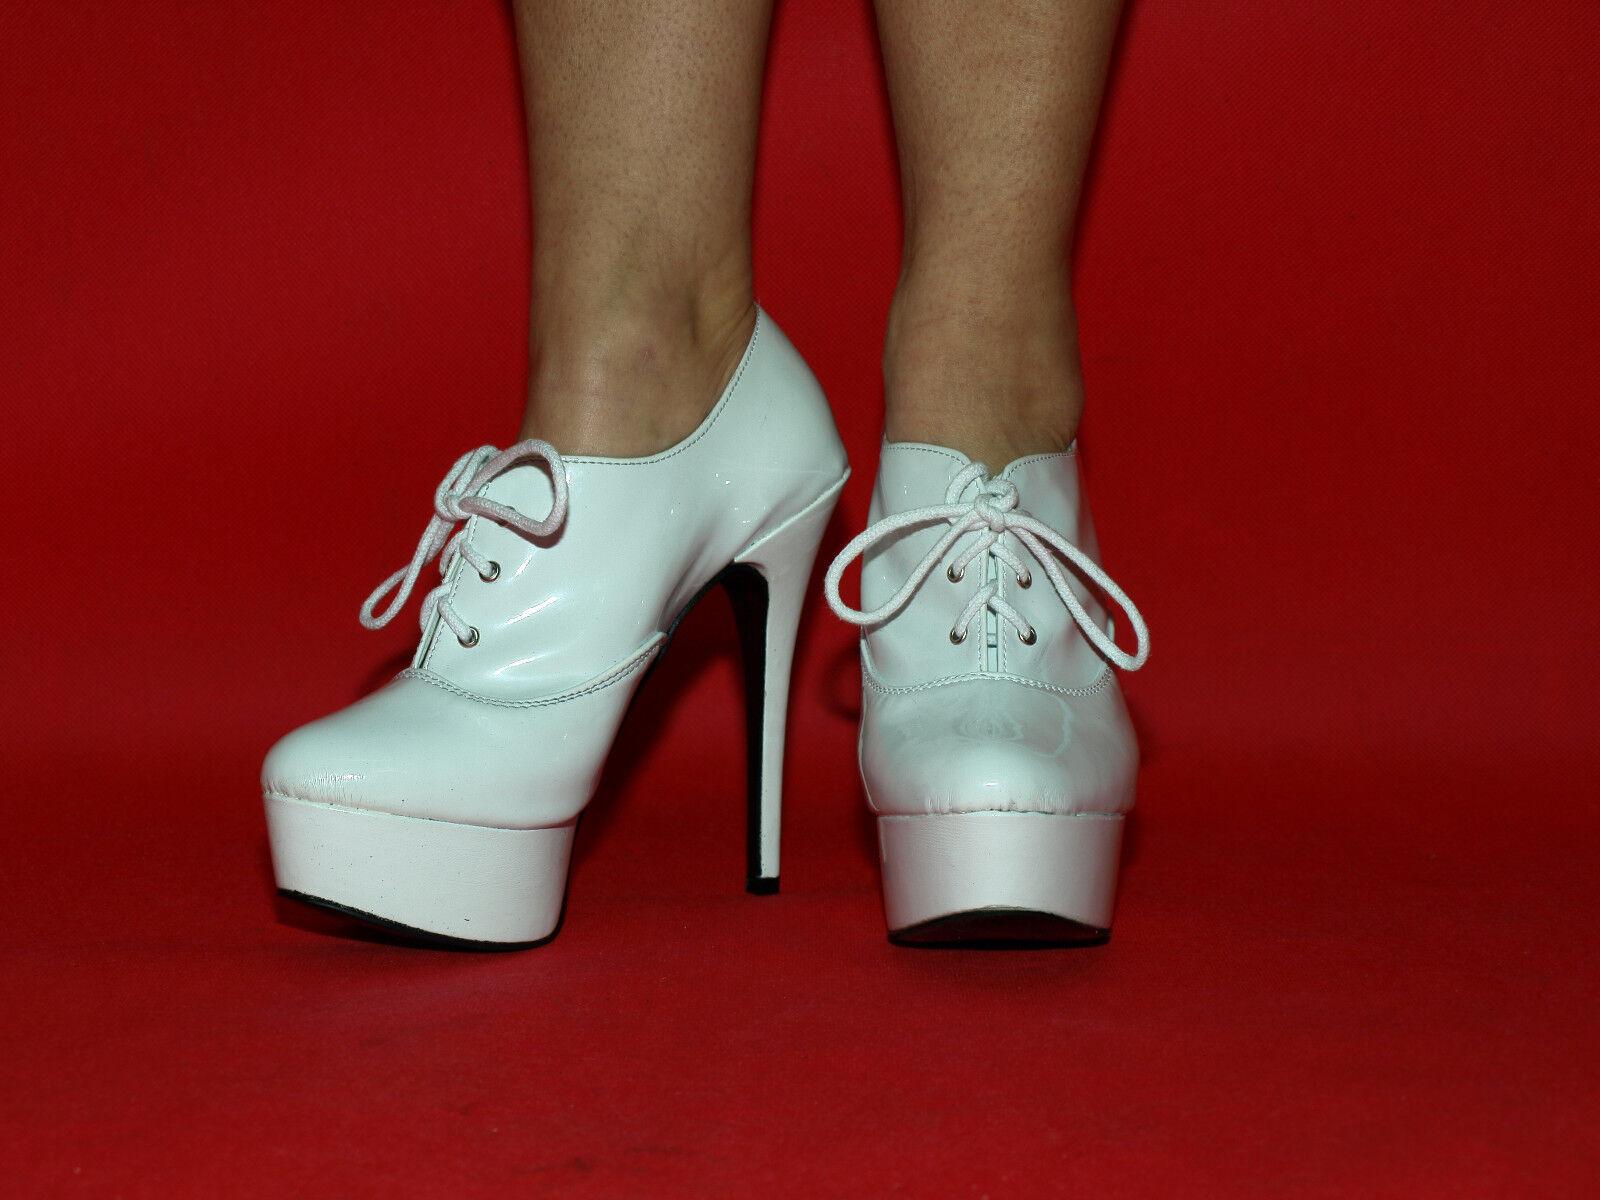 Latex 37 38 39 40 41 42 43 44 45 46 47 Bolingier-Poland heels 15cm FS1366